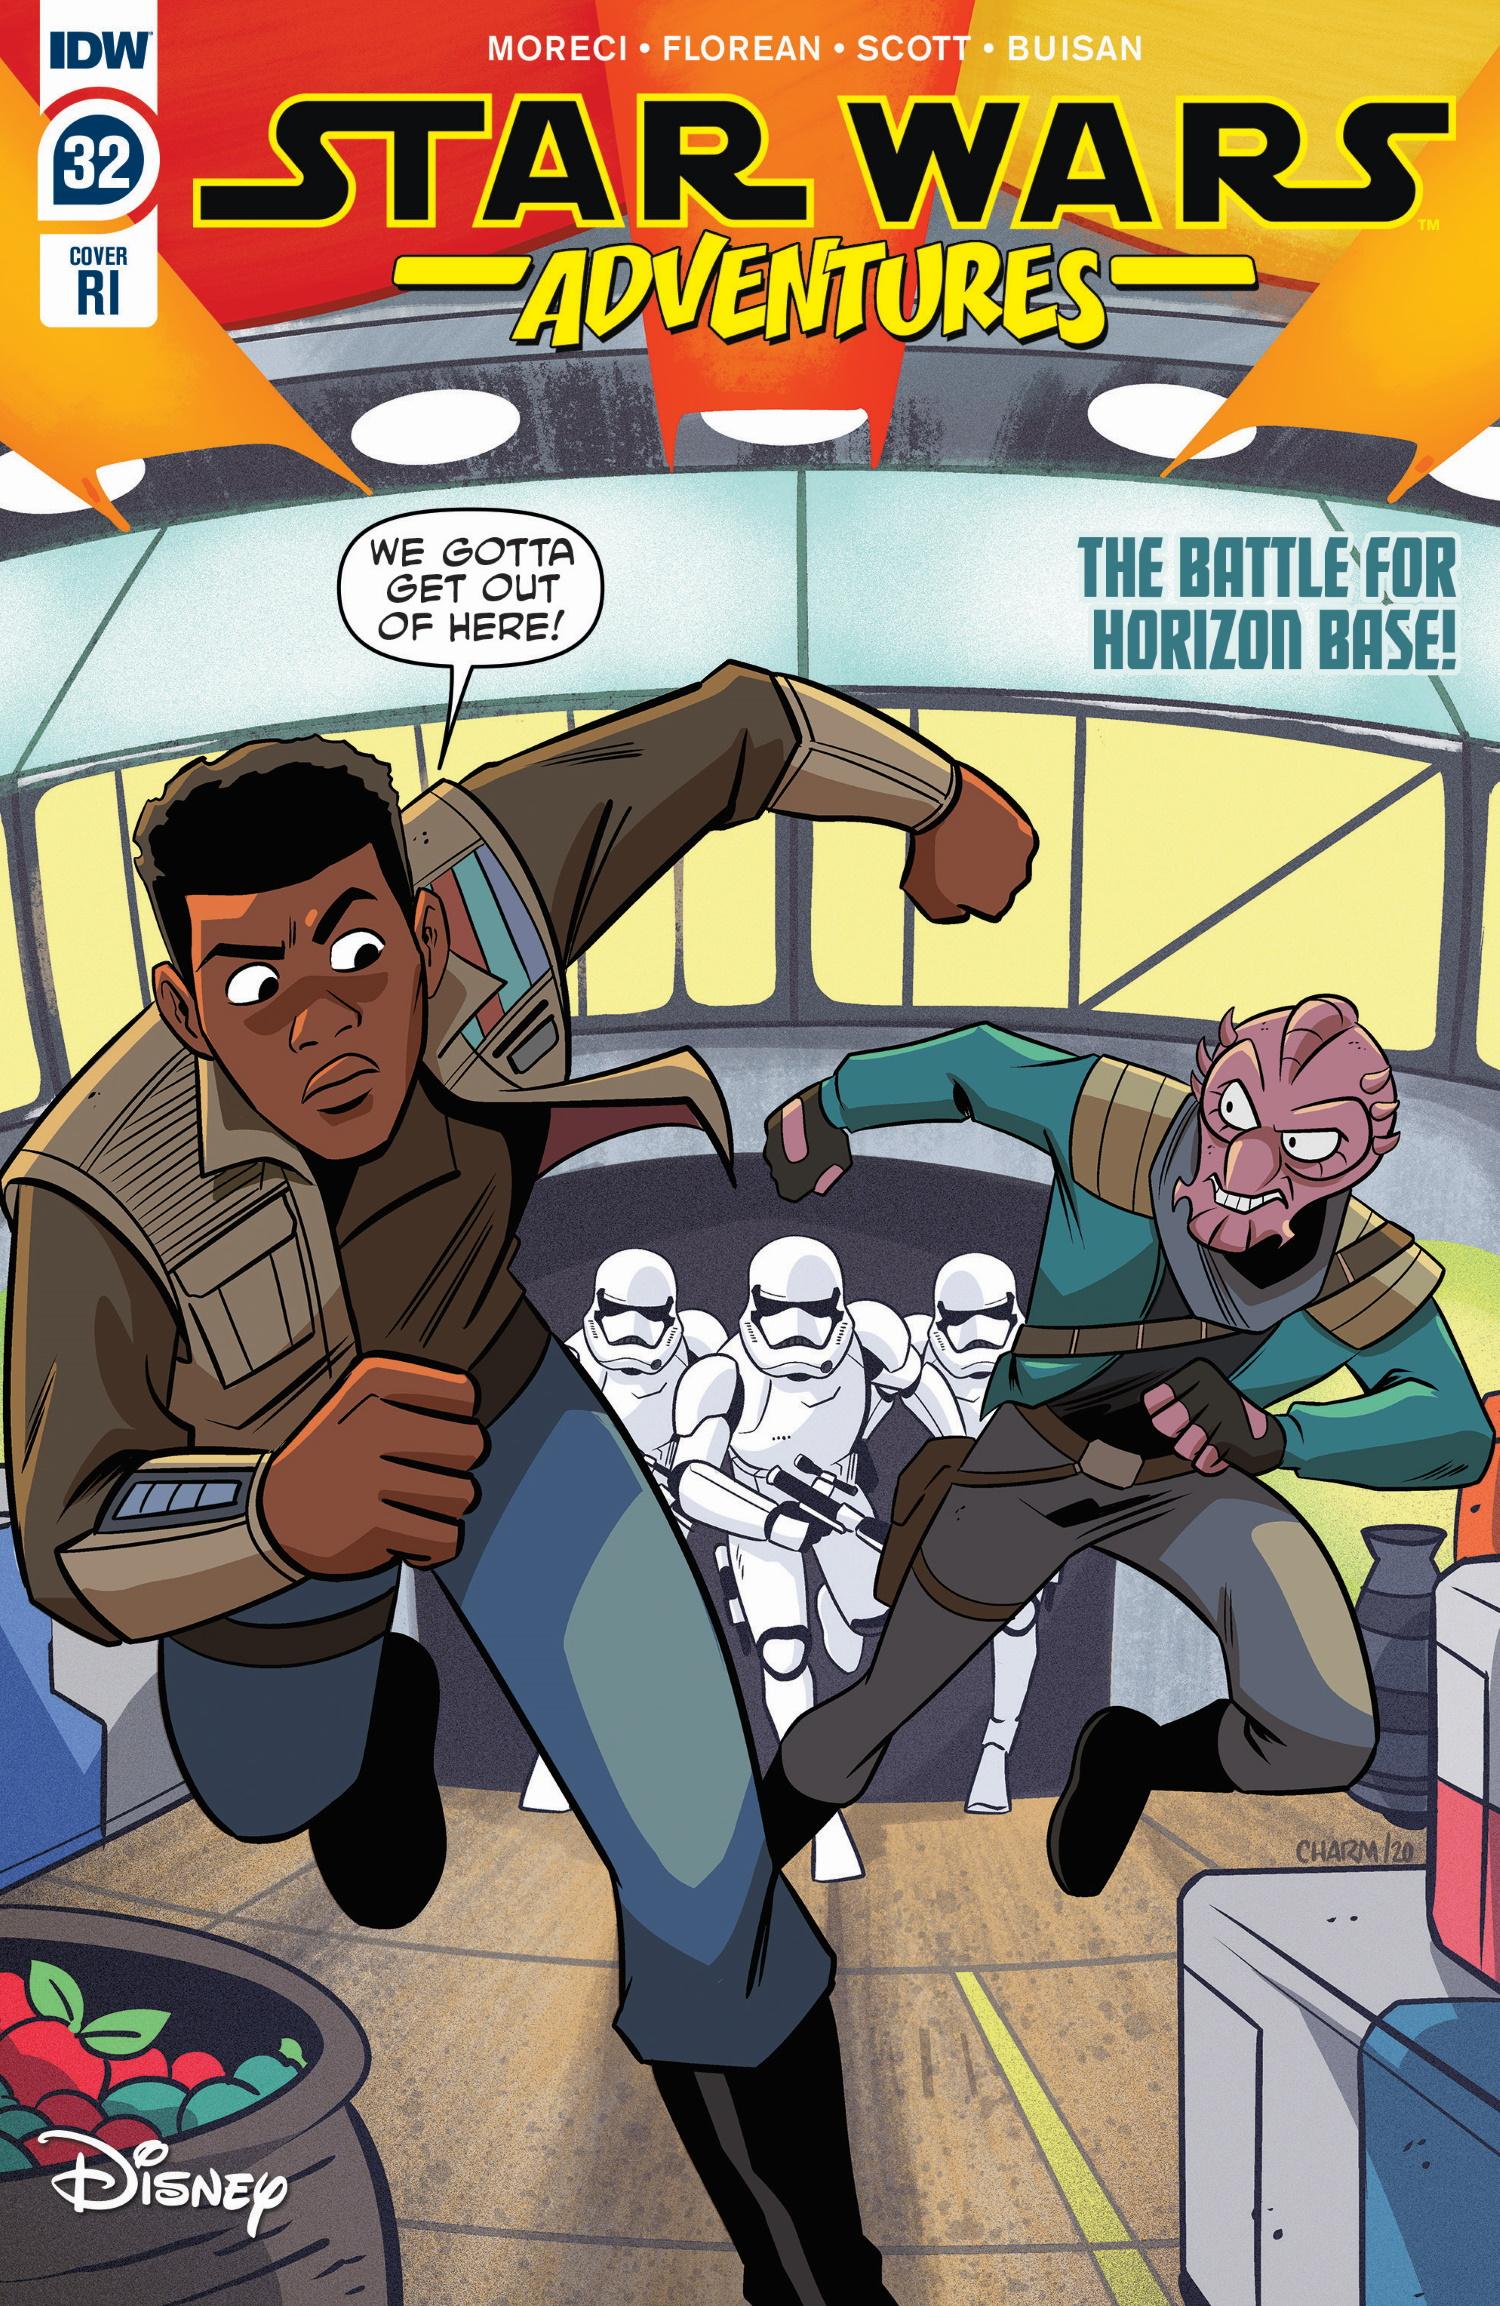 Star Wars Adventures #32 (Derek Charm Variant Cover) (15.07.2020)